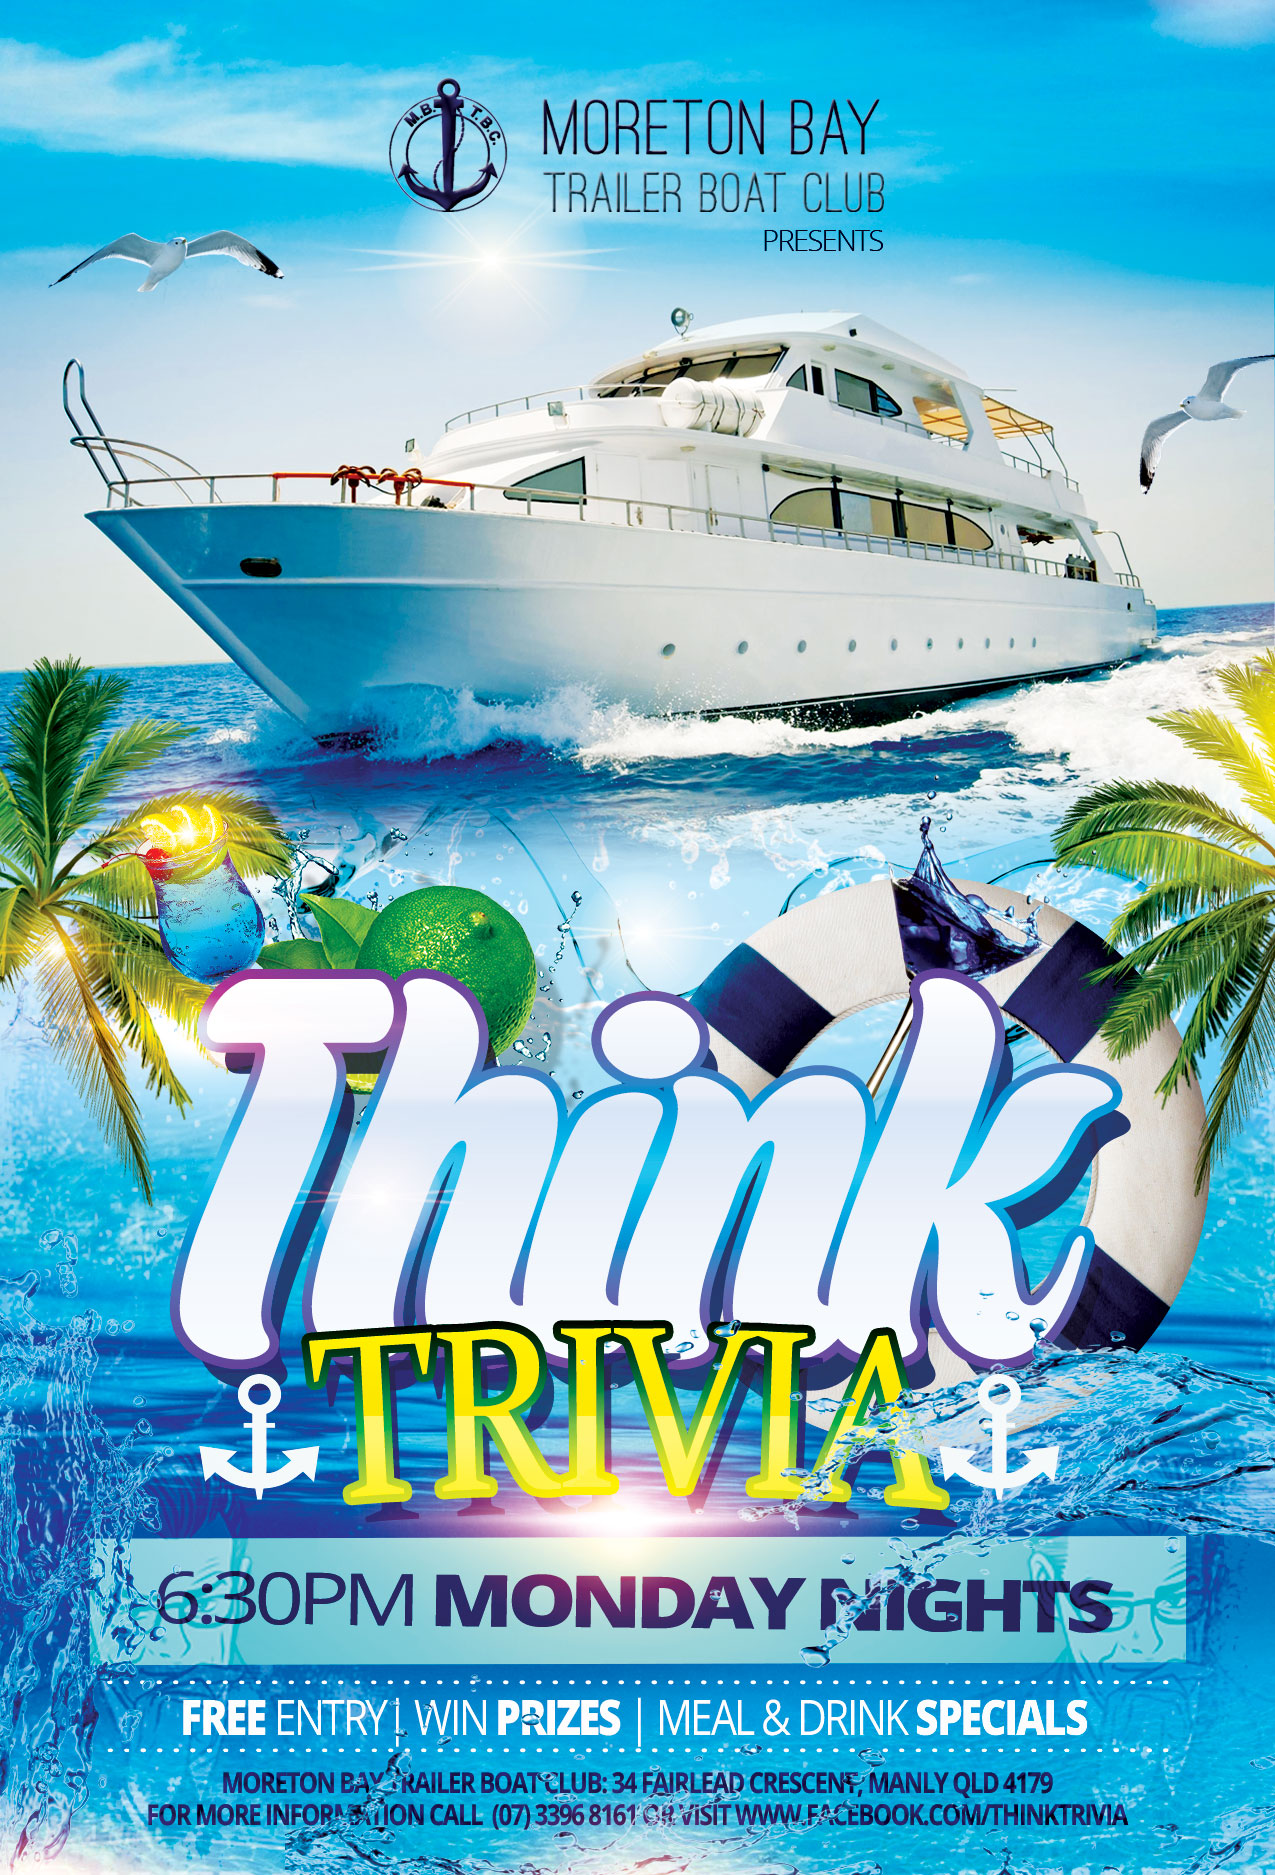 Moreton Bay Trailer Boat Club - Trivia Monday Night @ Moreton Bay Trailer Boat Club | Manly | Queensland | Australia